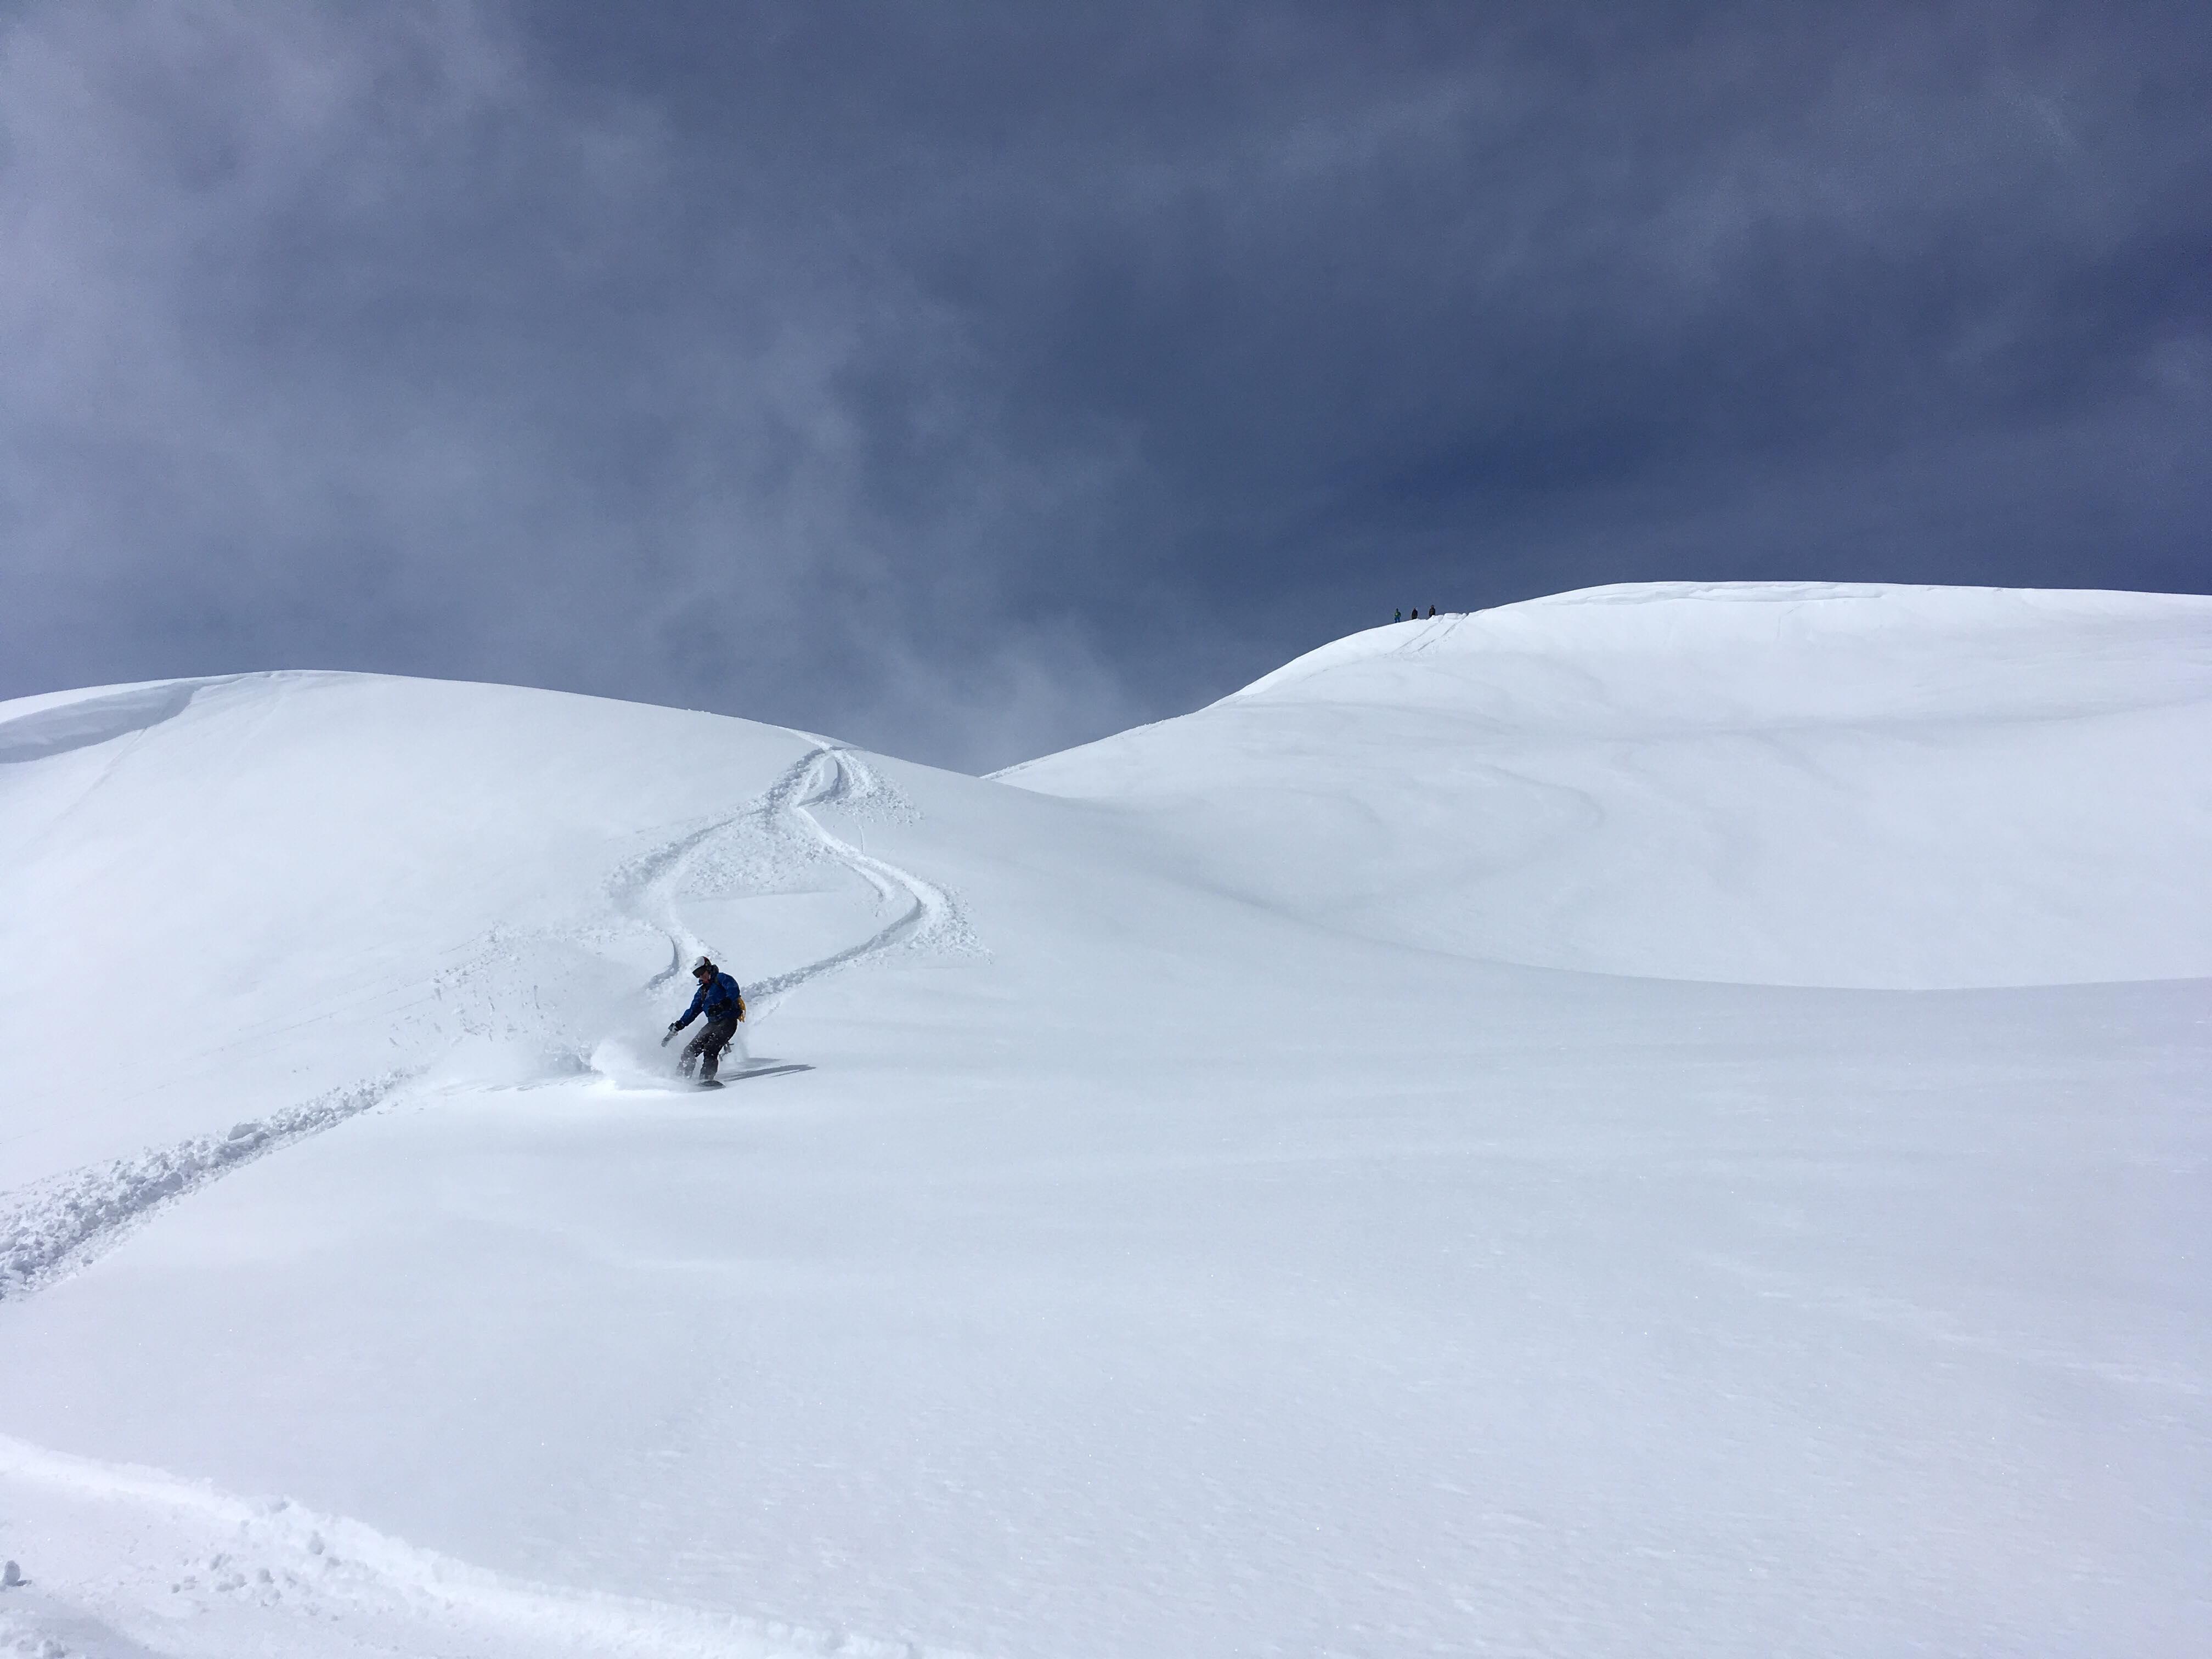 Col de la Louze snowboard 7